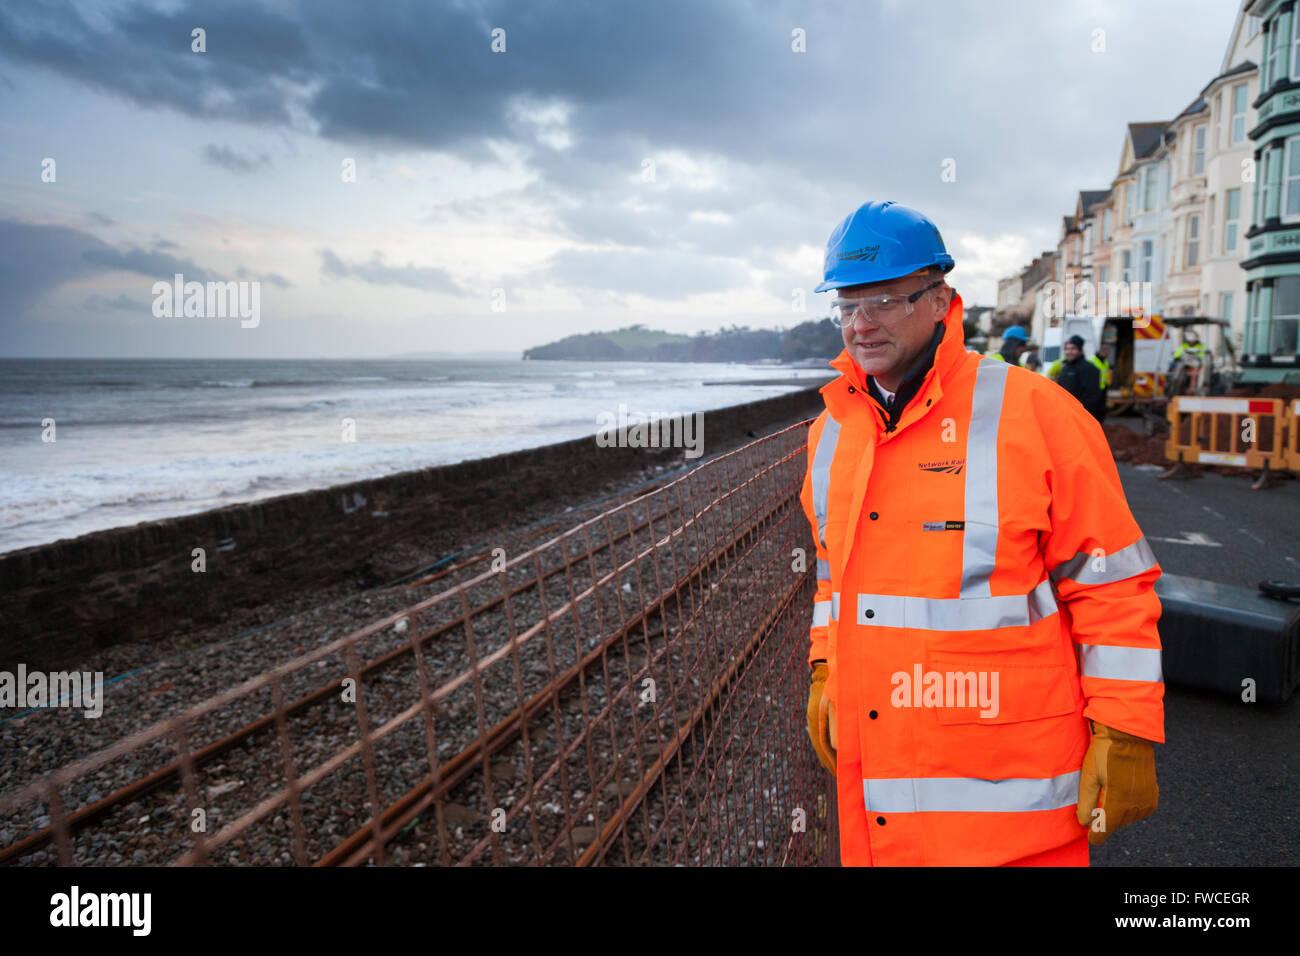 05/02/13 Network Rail Chief Exec Mark Carne inspecting storm damage at Dawlish, Devon, England. - Stock Image